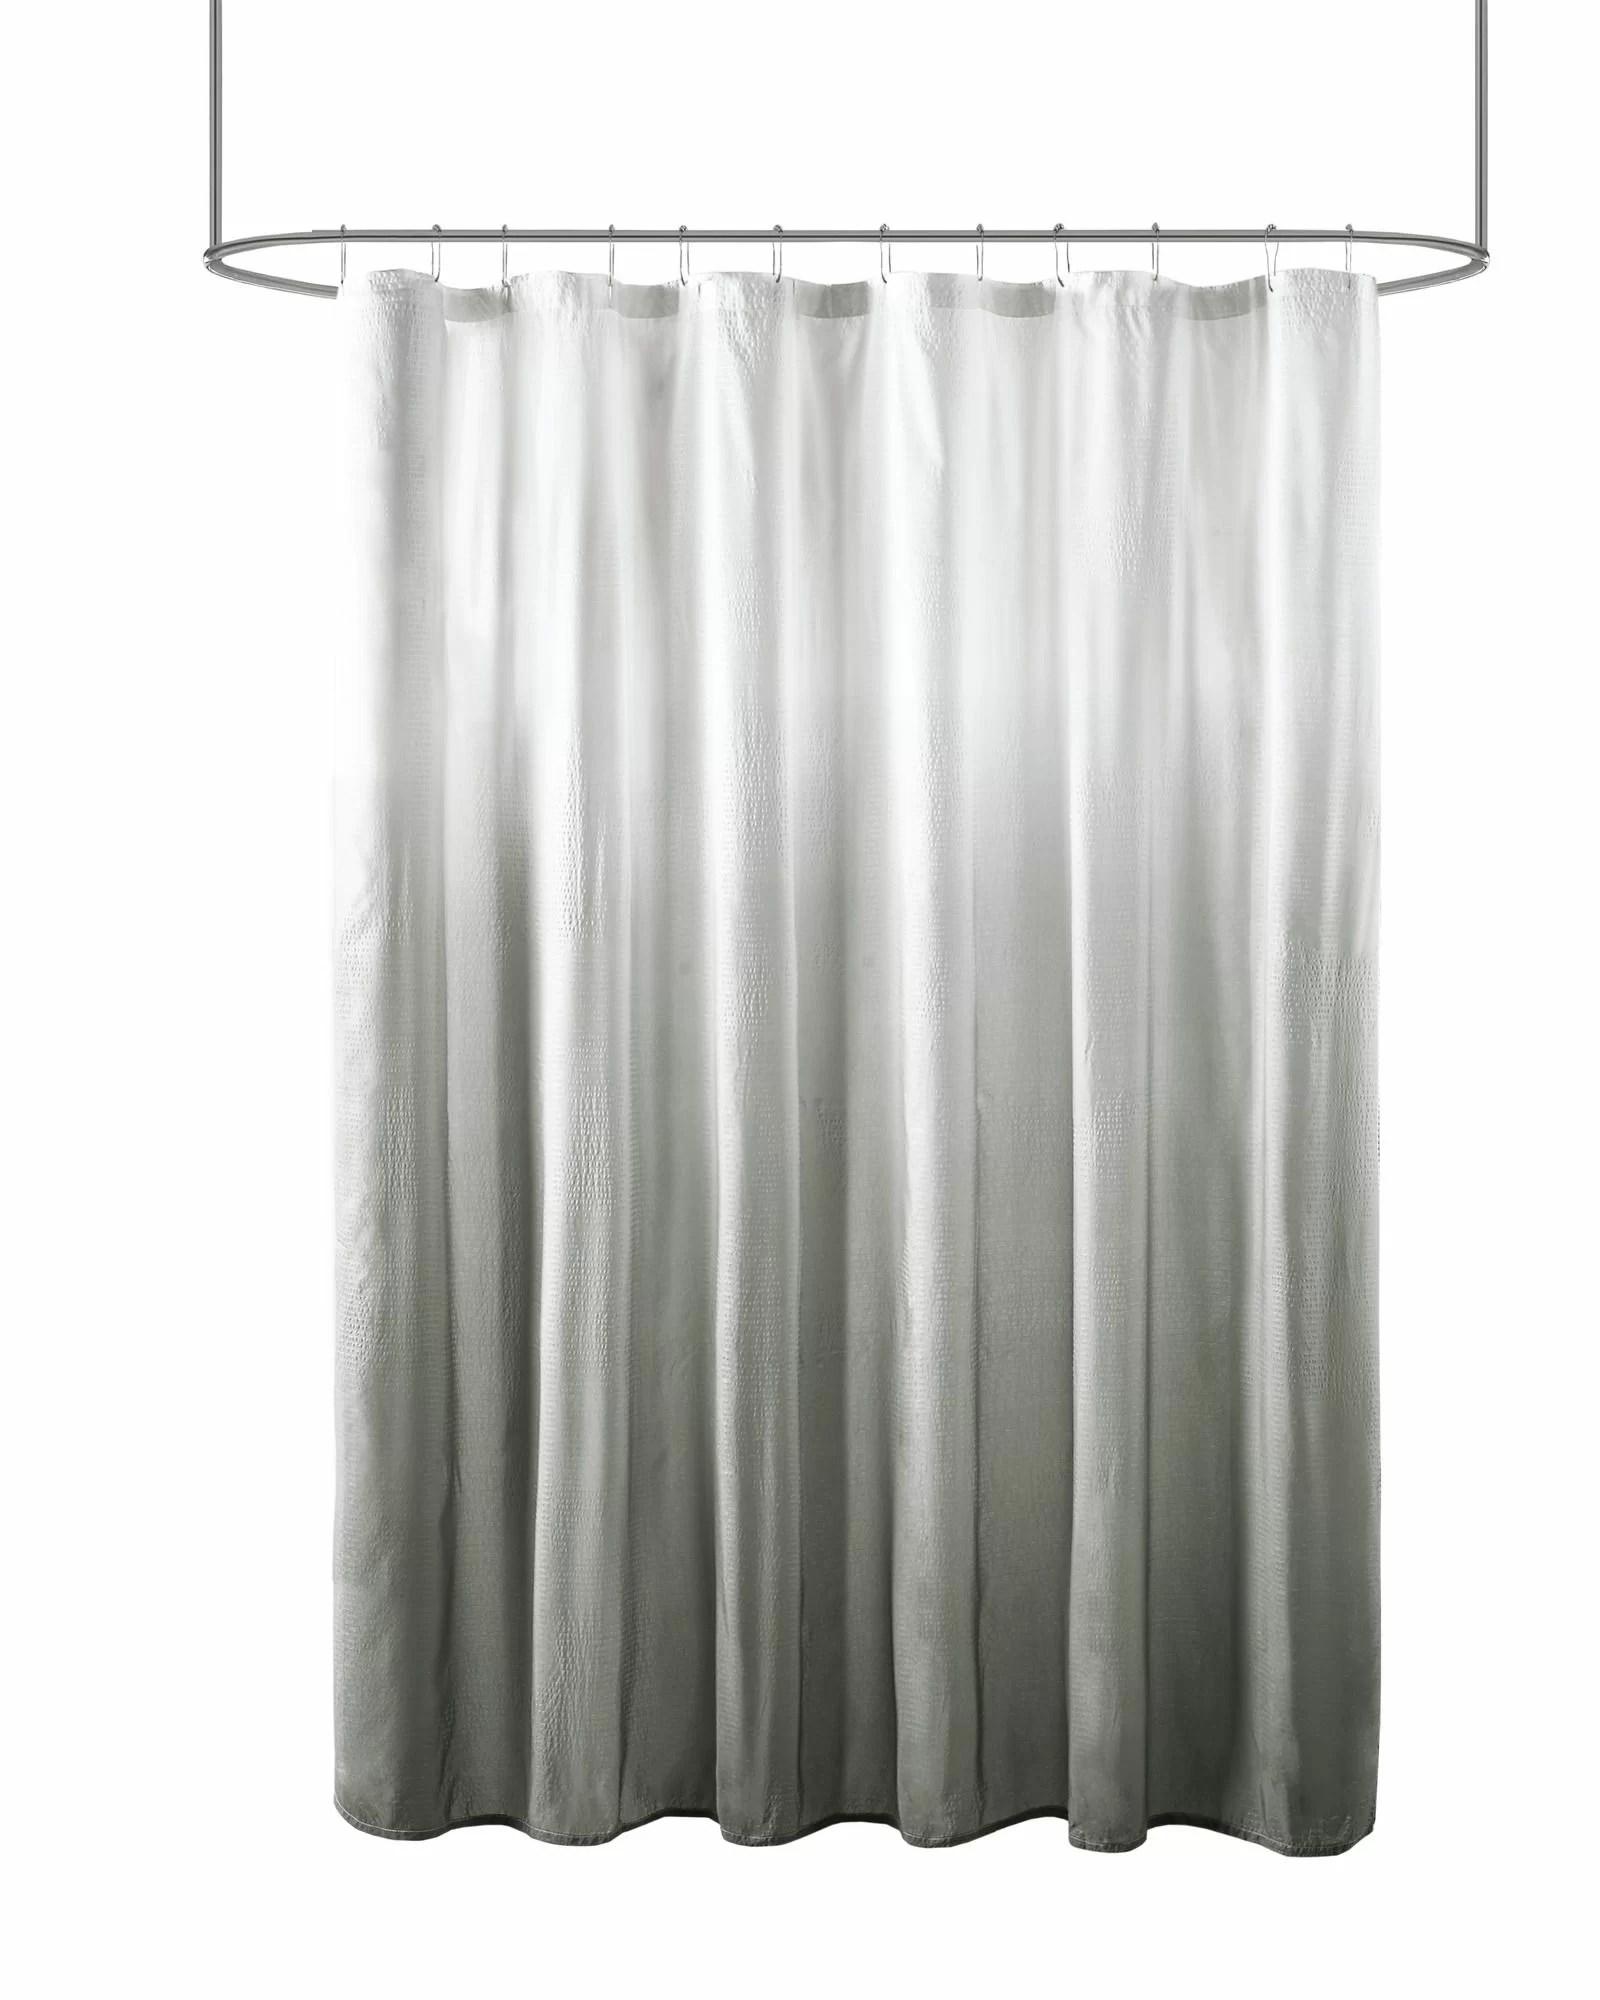 willandra ombre printed seersucker abstract single shower curtain